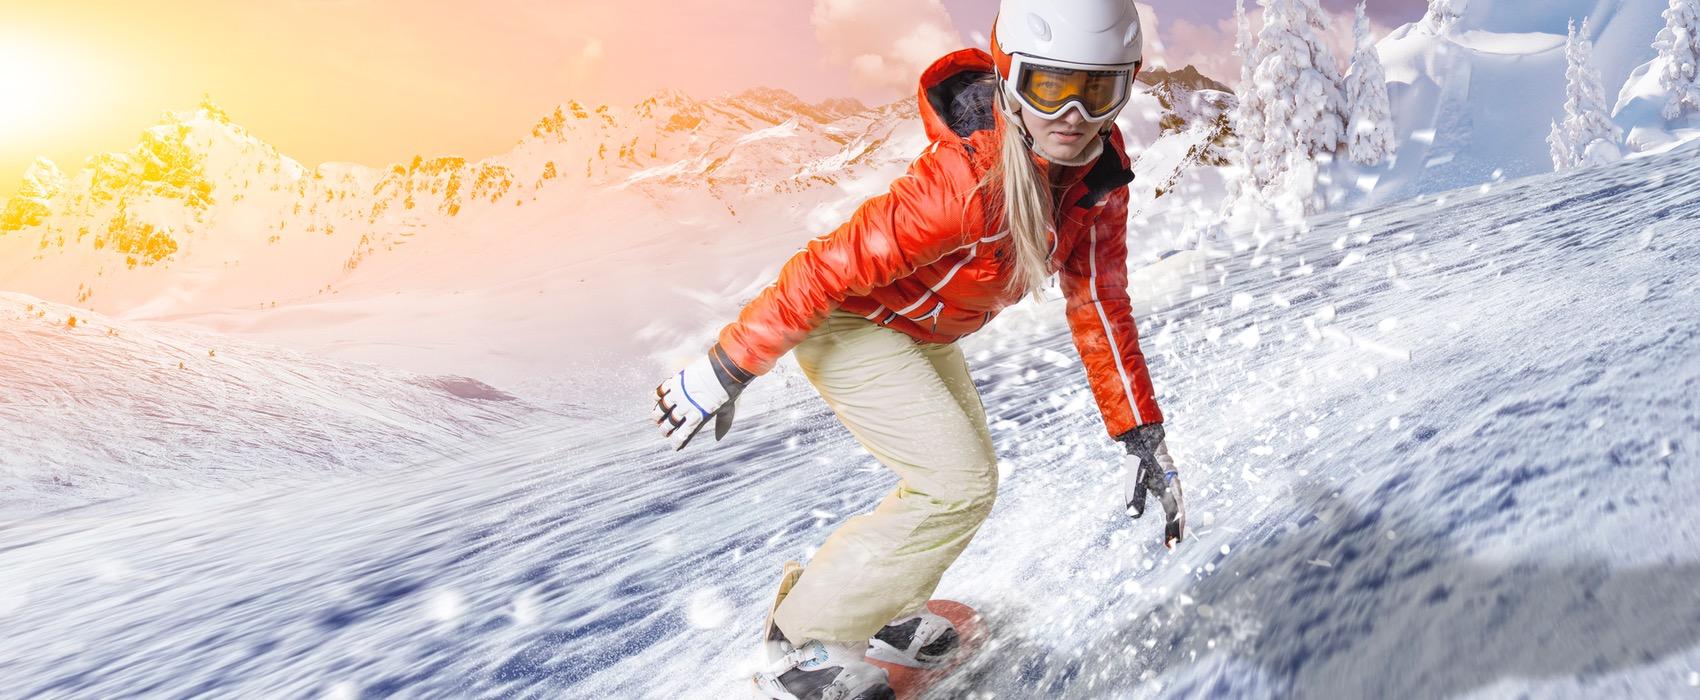 Snowboarderin am Hang.